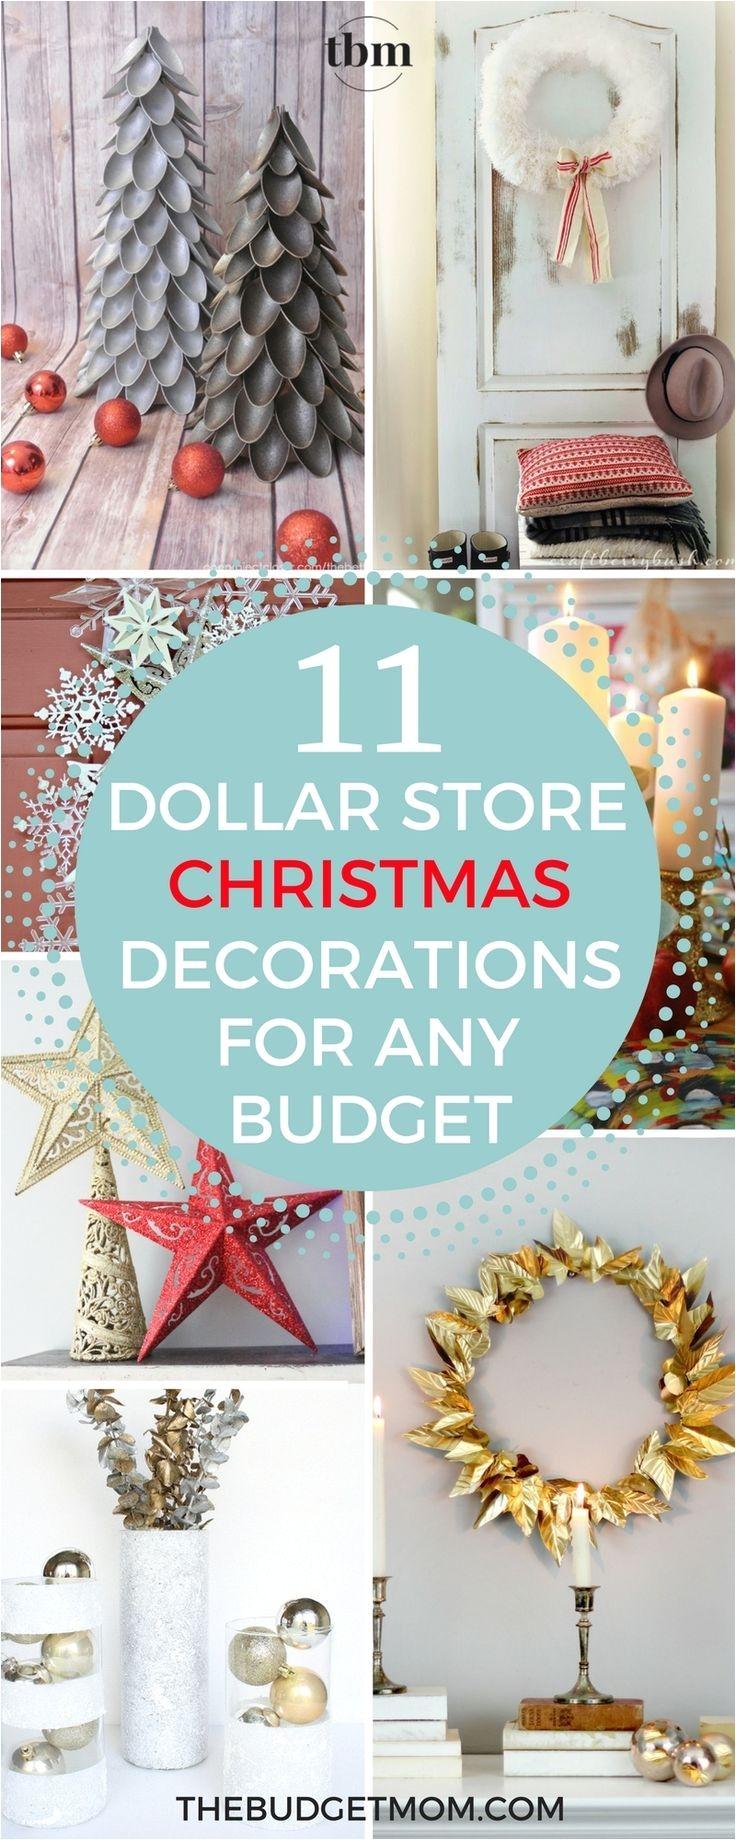 Dollar General Christmas Decorations 2017 11 Glamorous Dollar Store Christmas Decorations for Any Budget